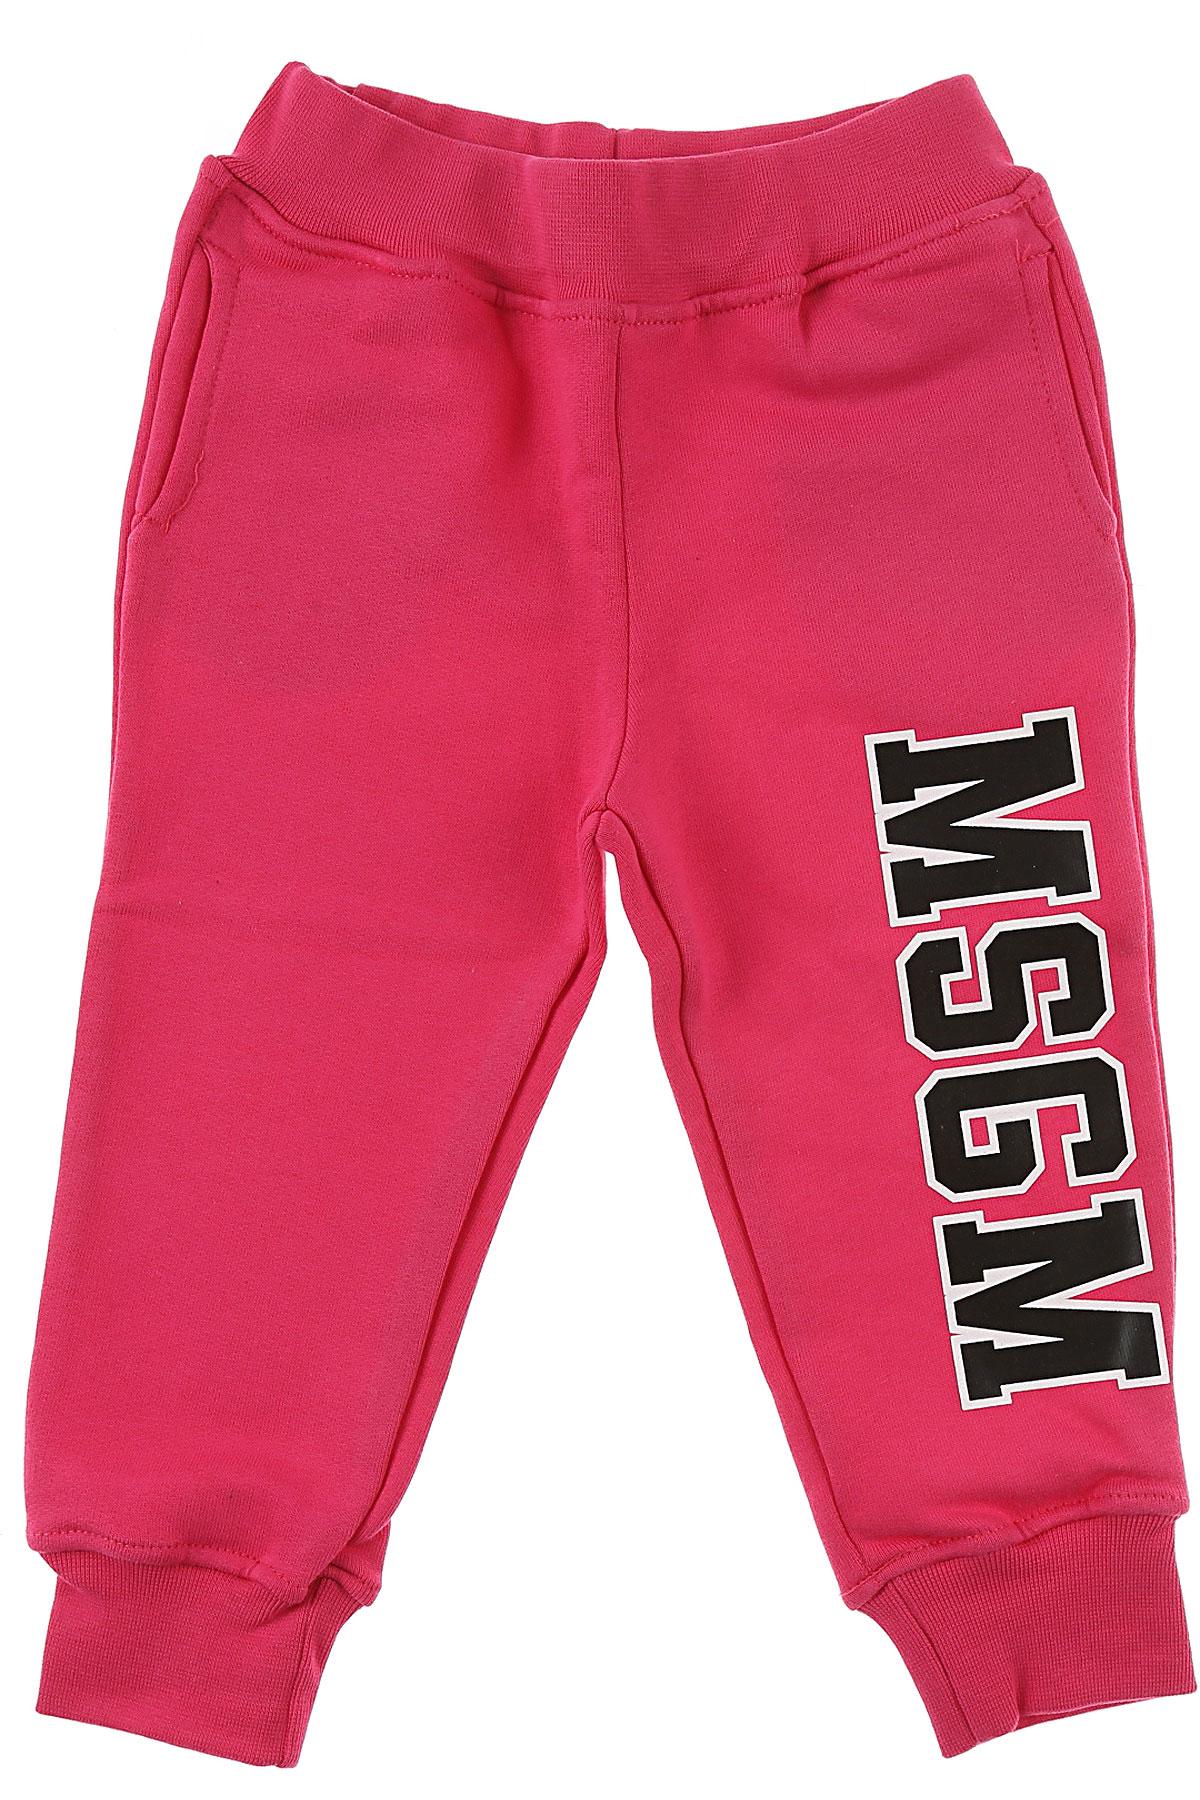 Image of MSGM Baby Sweatpants for Girls, Fuchsia, Cotton, 2017, 12M 18M 6M 9M